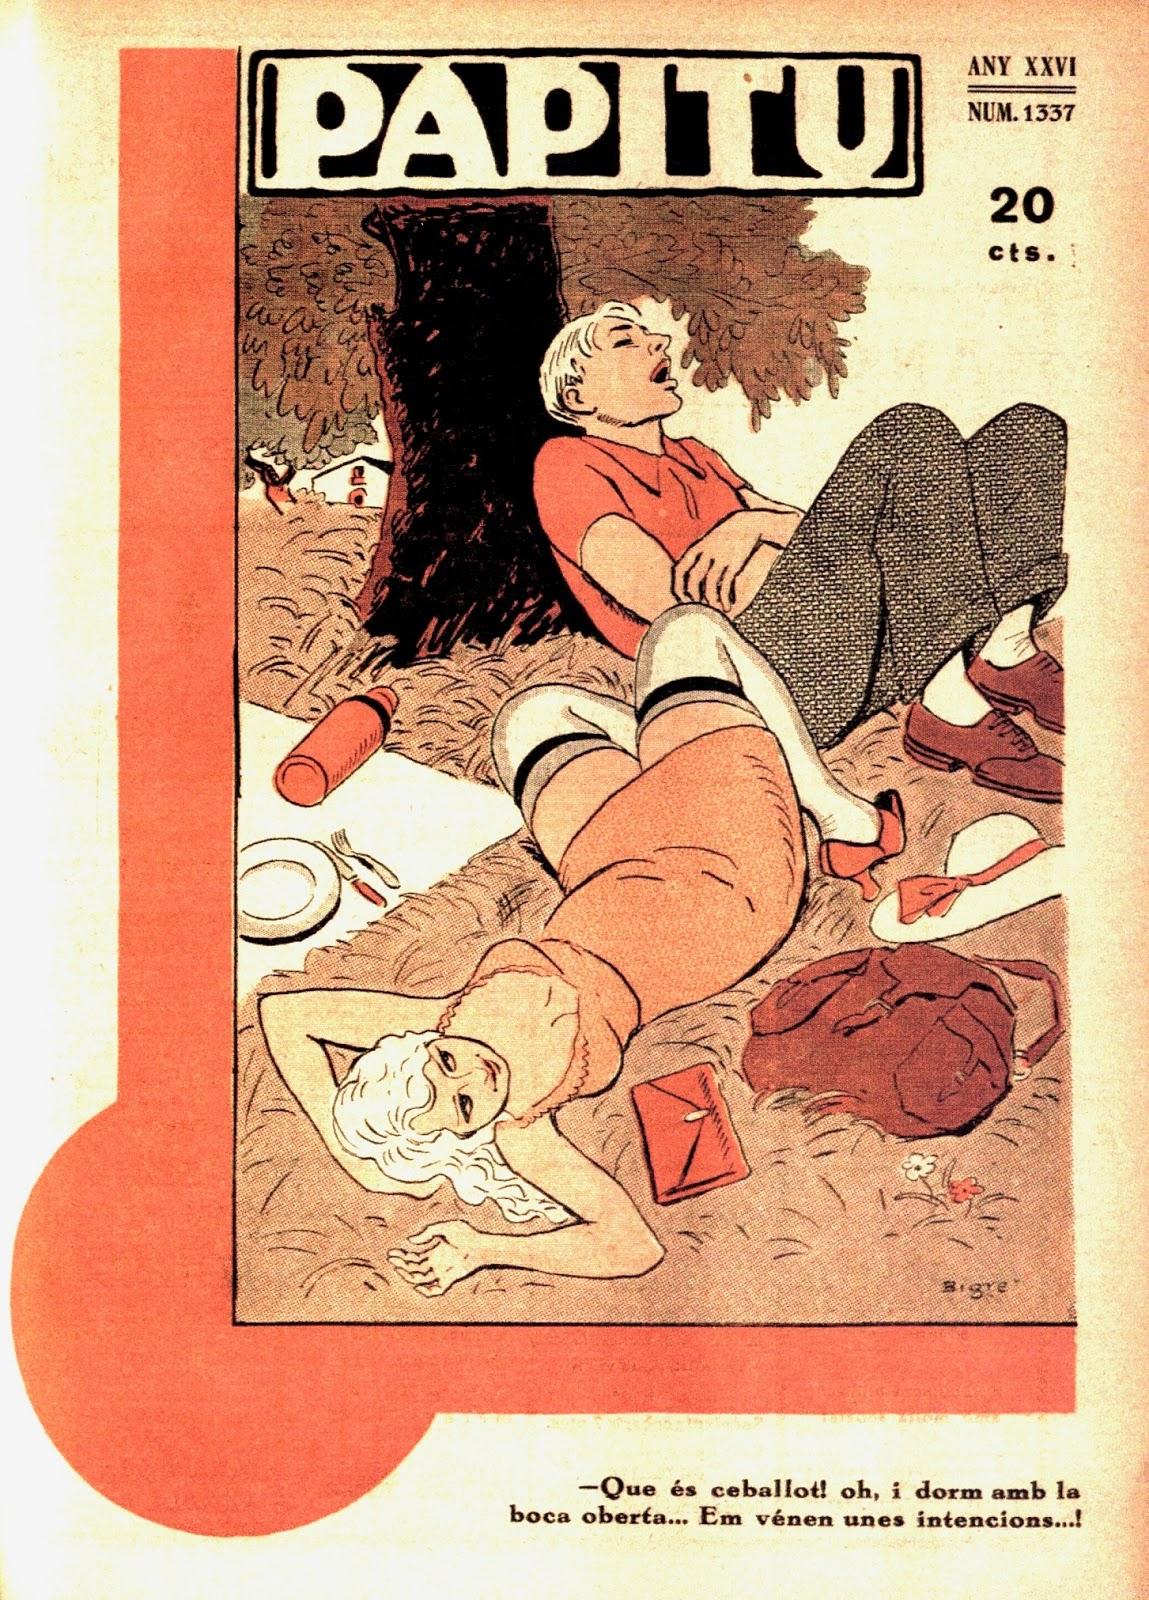 Revista Papitu, octubre 1934, portada per Ricard Opisso